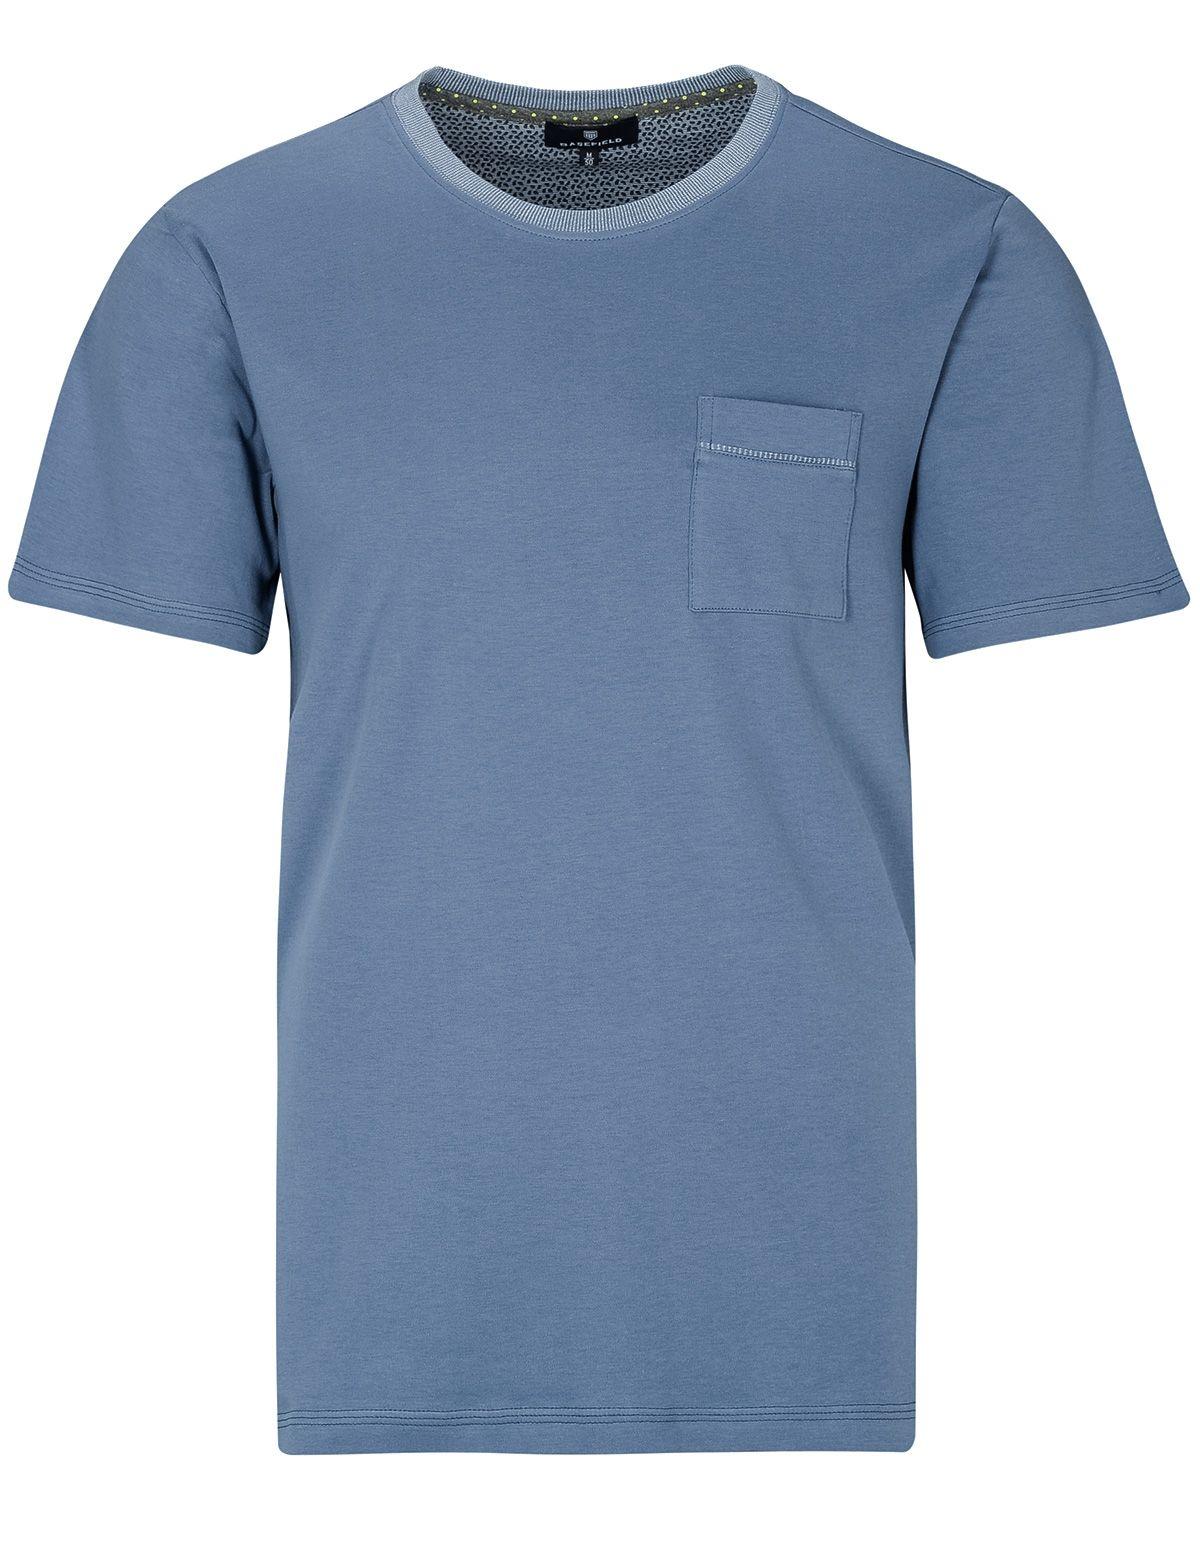 Homewear Shirt - Sky